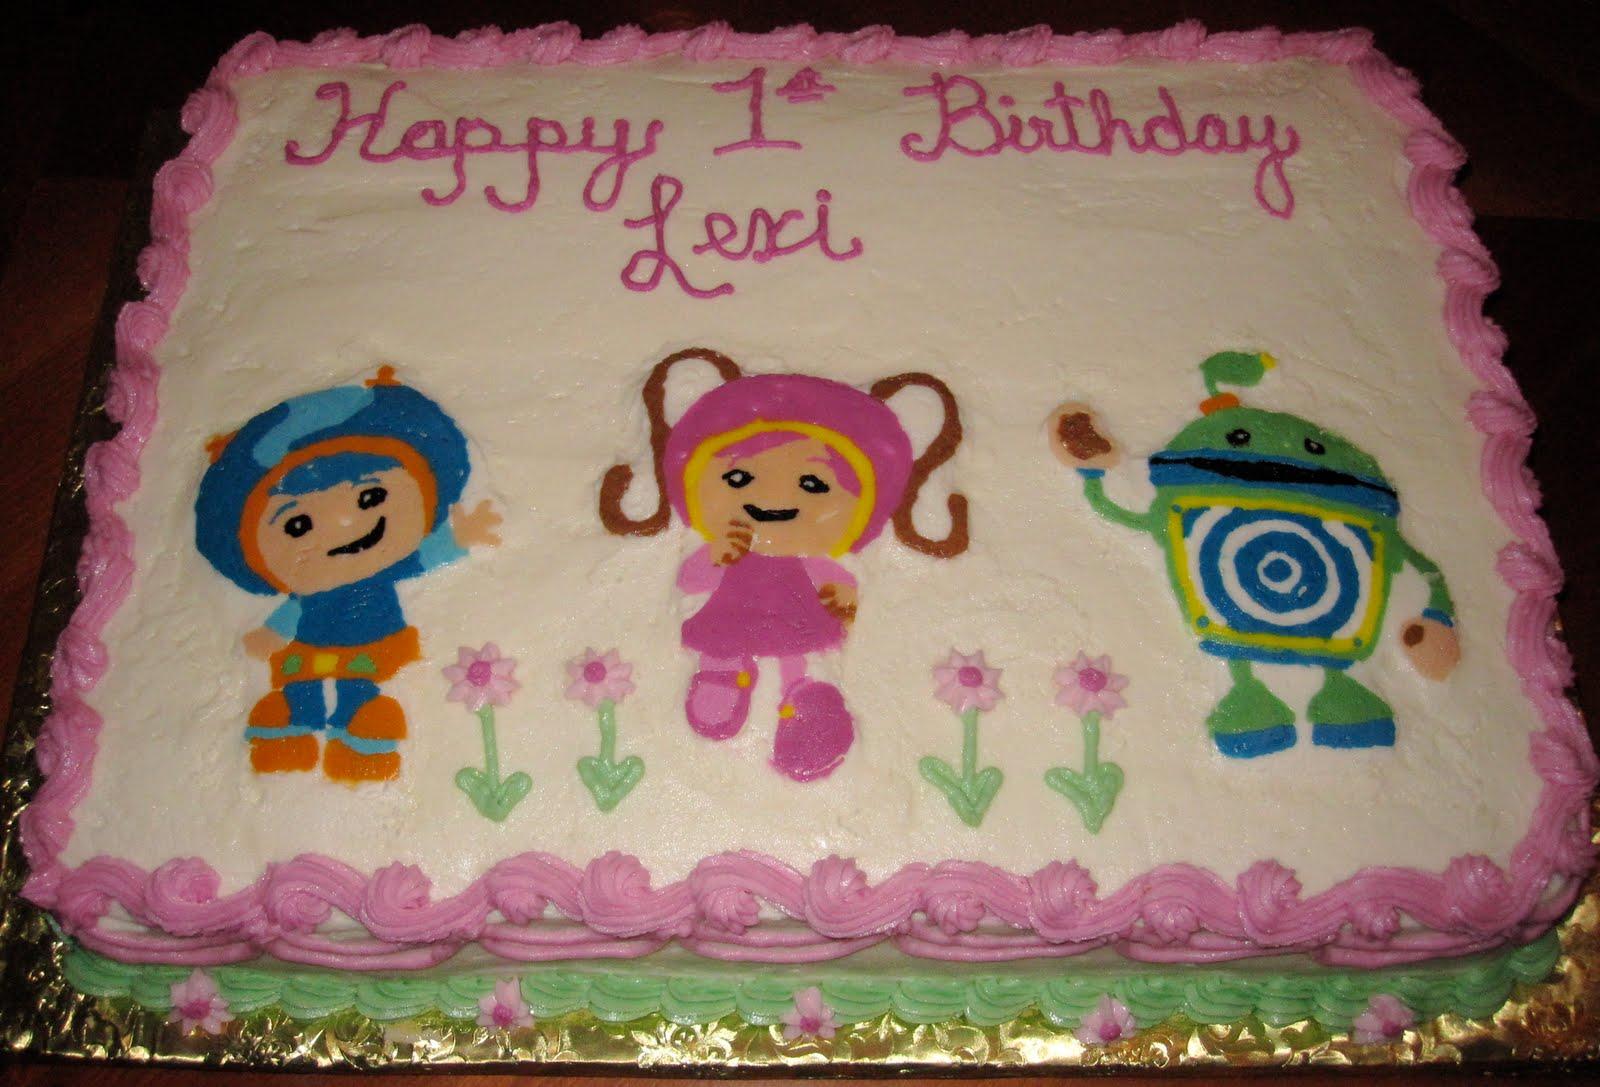 Delicious Walmart Birthday Cake Ideas And Designs